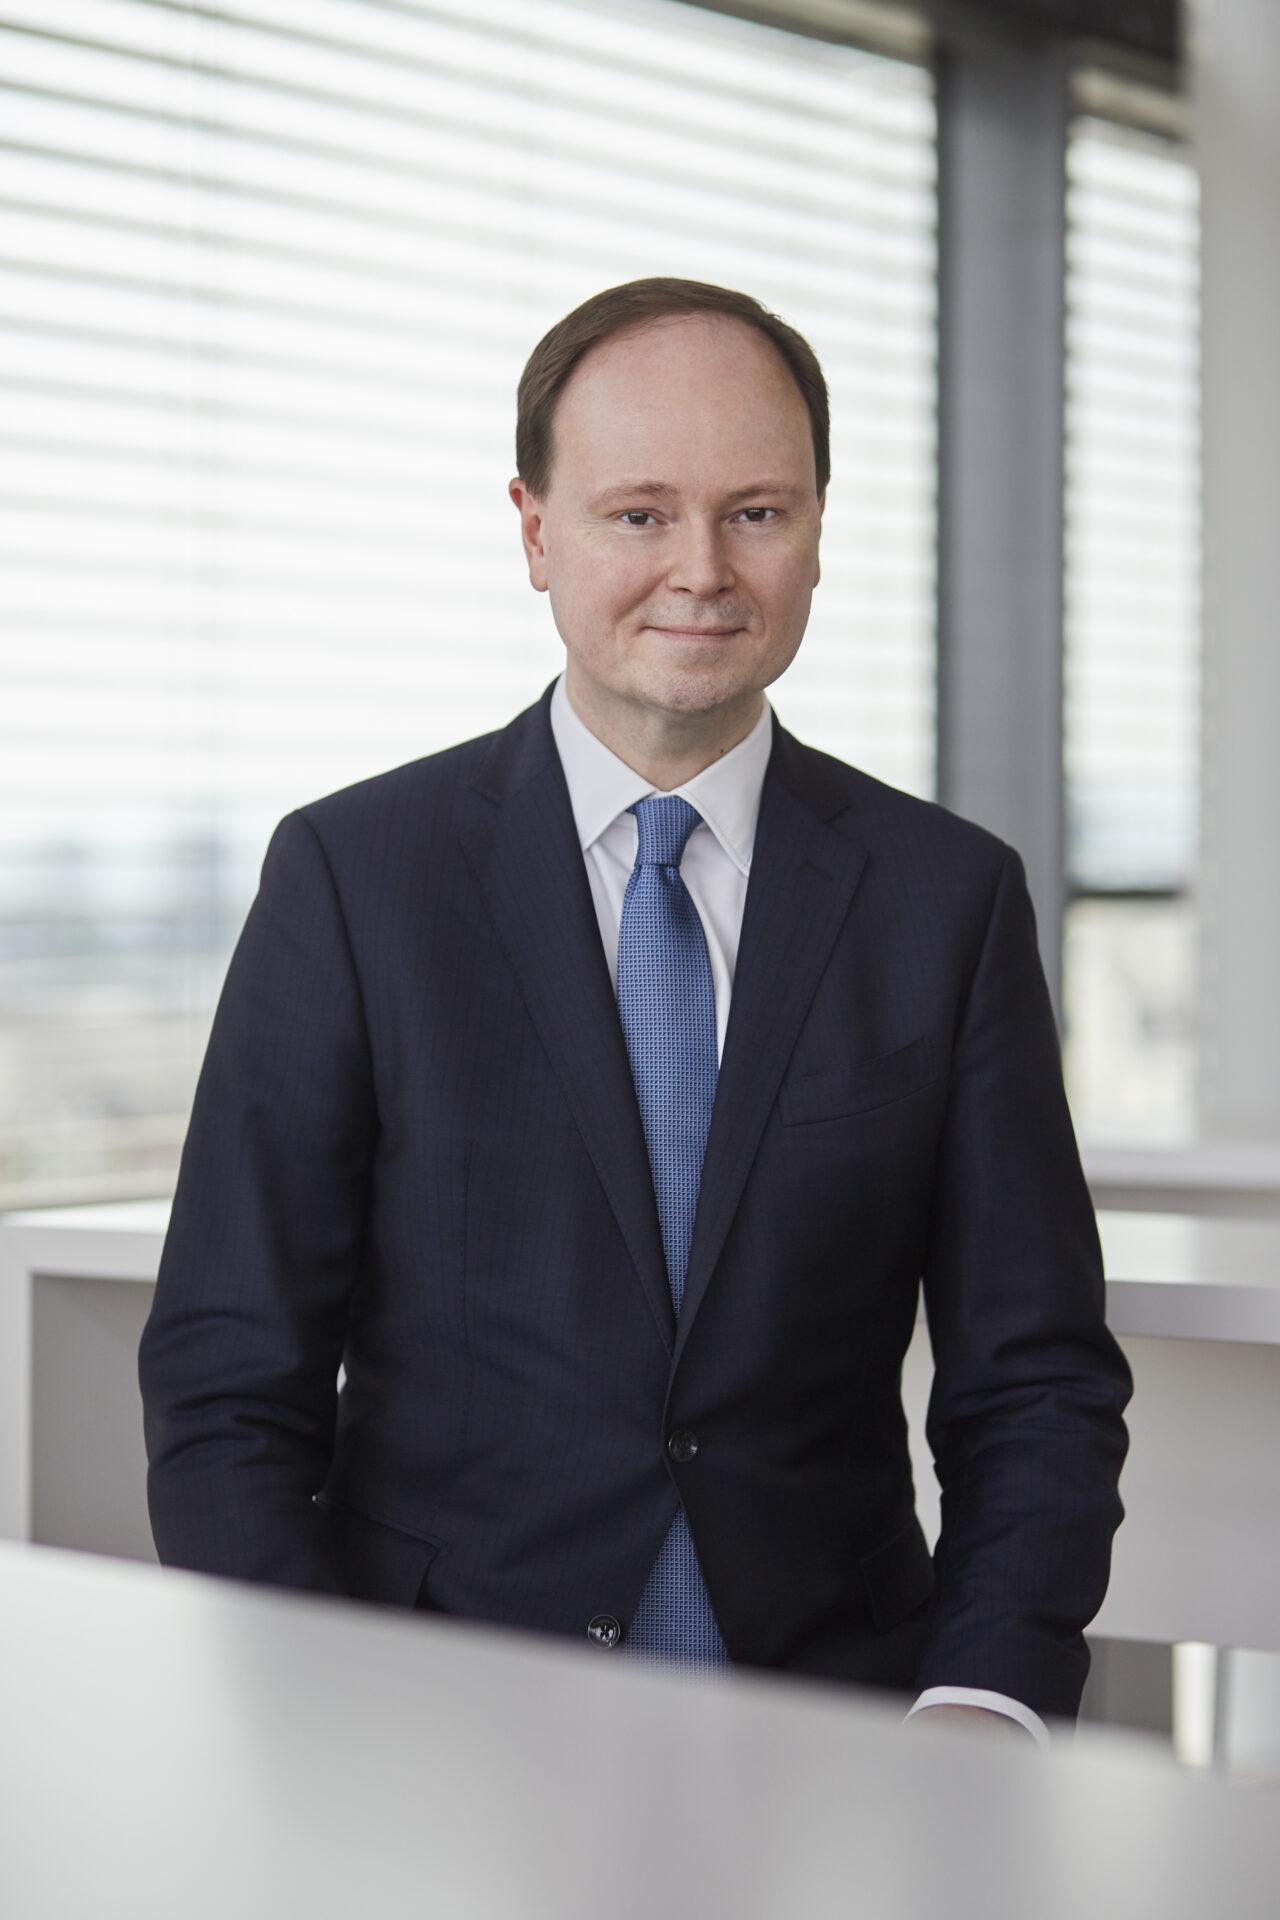 https://intelligent-investors.de/wp-content/uploads/2020/05/Marc-Alexander_Kniess_0722_HighRes_RGB-1280x1920.jpg